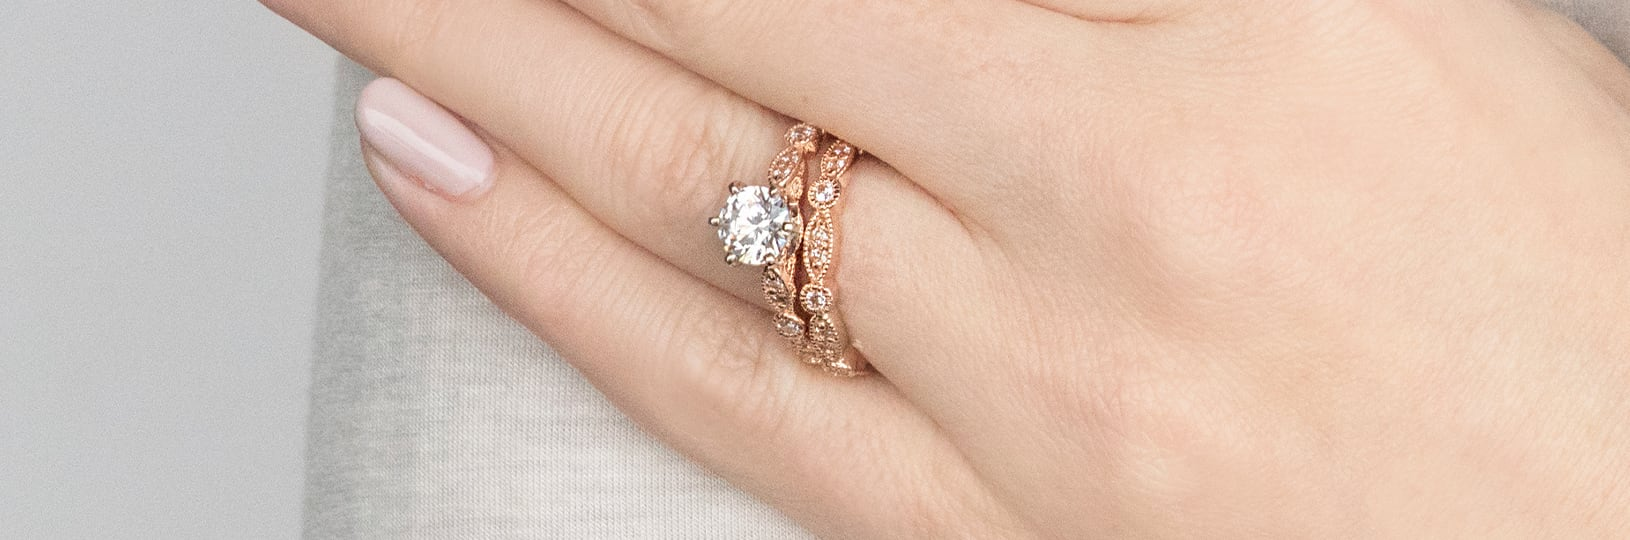 Matching accented wedding ring set.